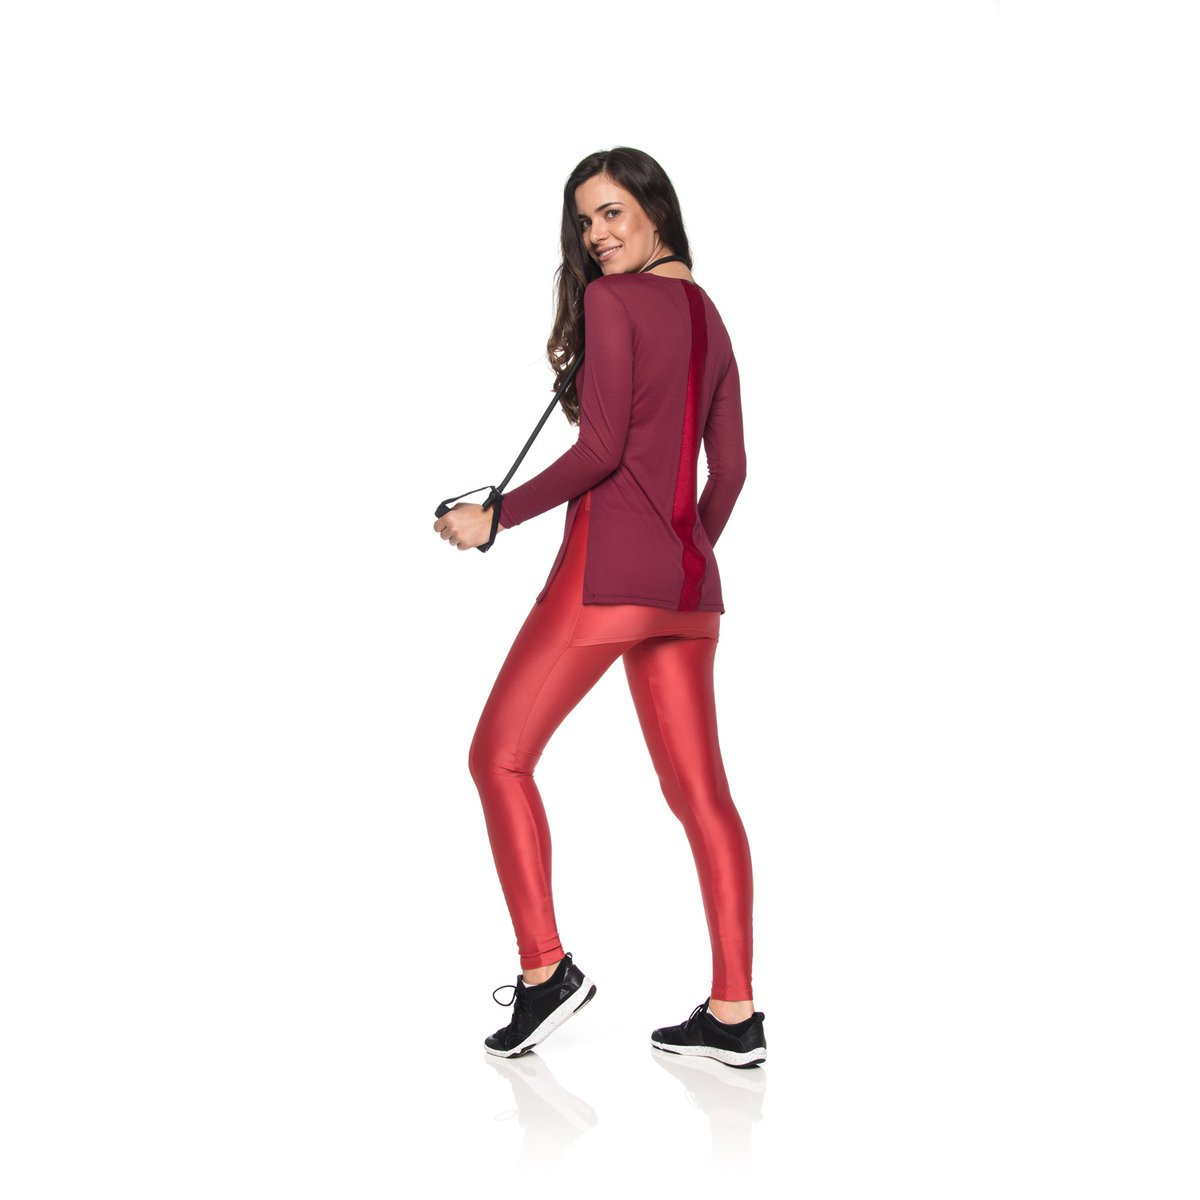 P Marsala Fitness Claro Fitness Claro Claro Marsala Cover Legging Cover Laranja Leggings zqWRgRa